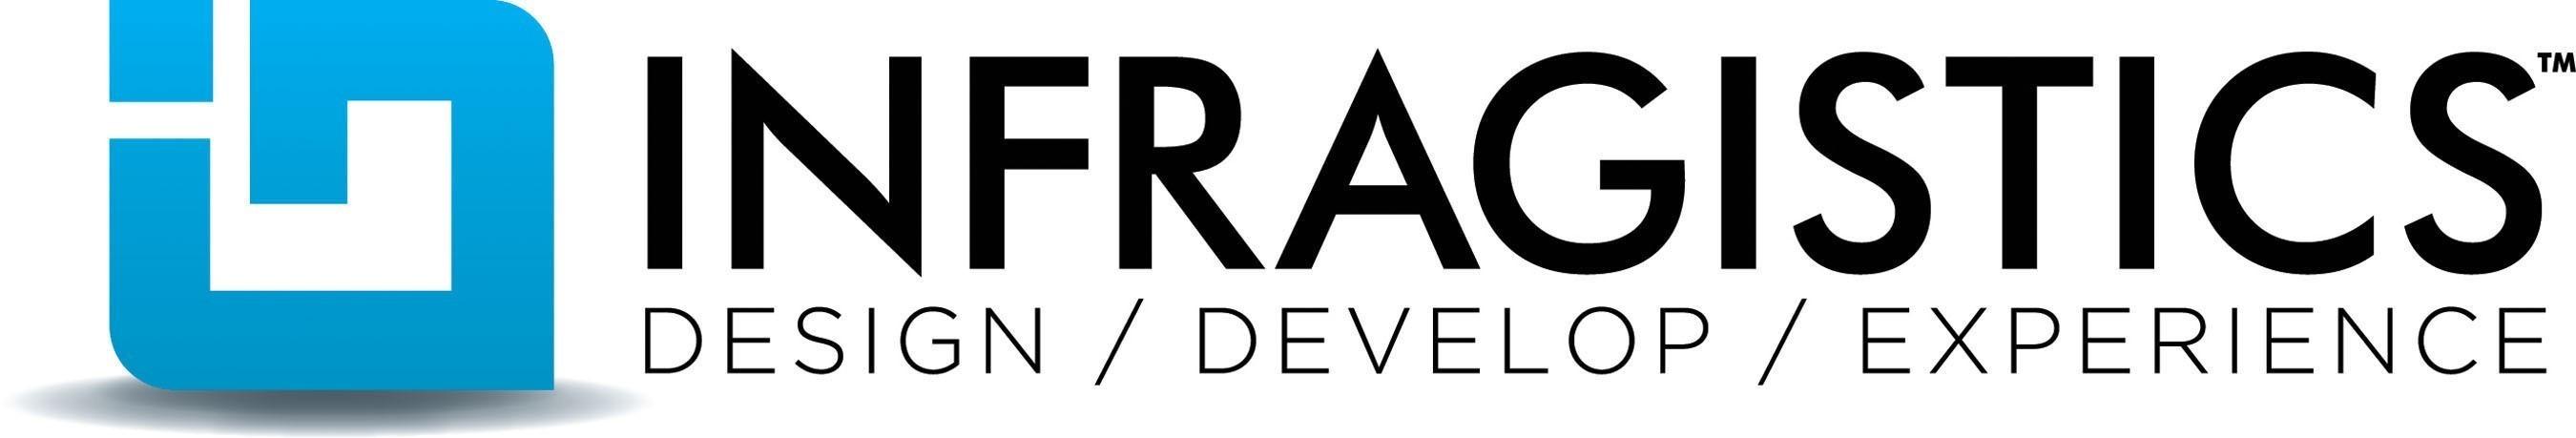 Infragistics, Inc. Logo. (PRNewsFoto/Infragistics) (PRNewsFoto/Infragistics)